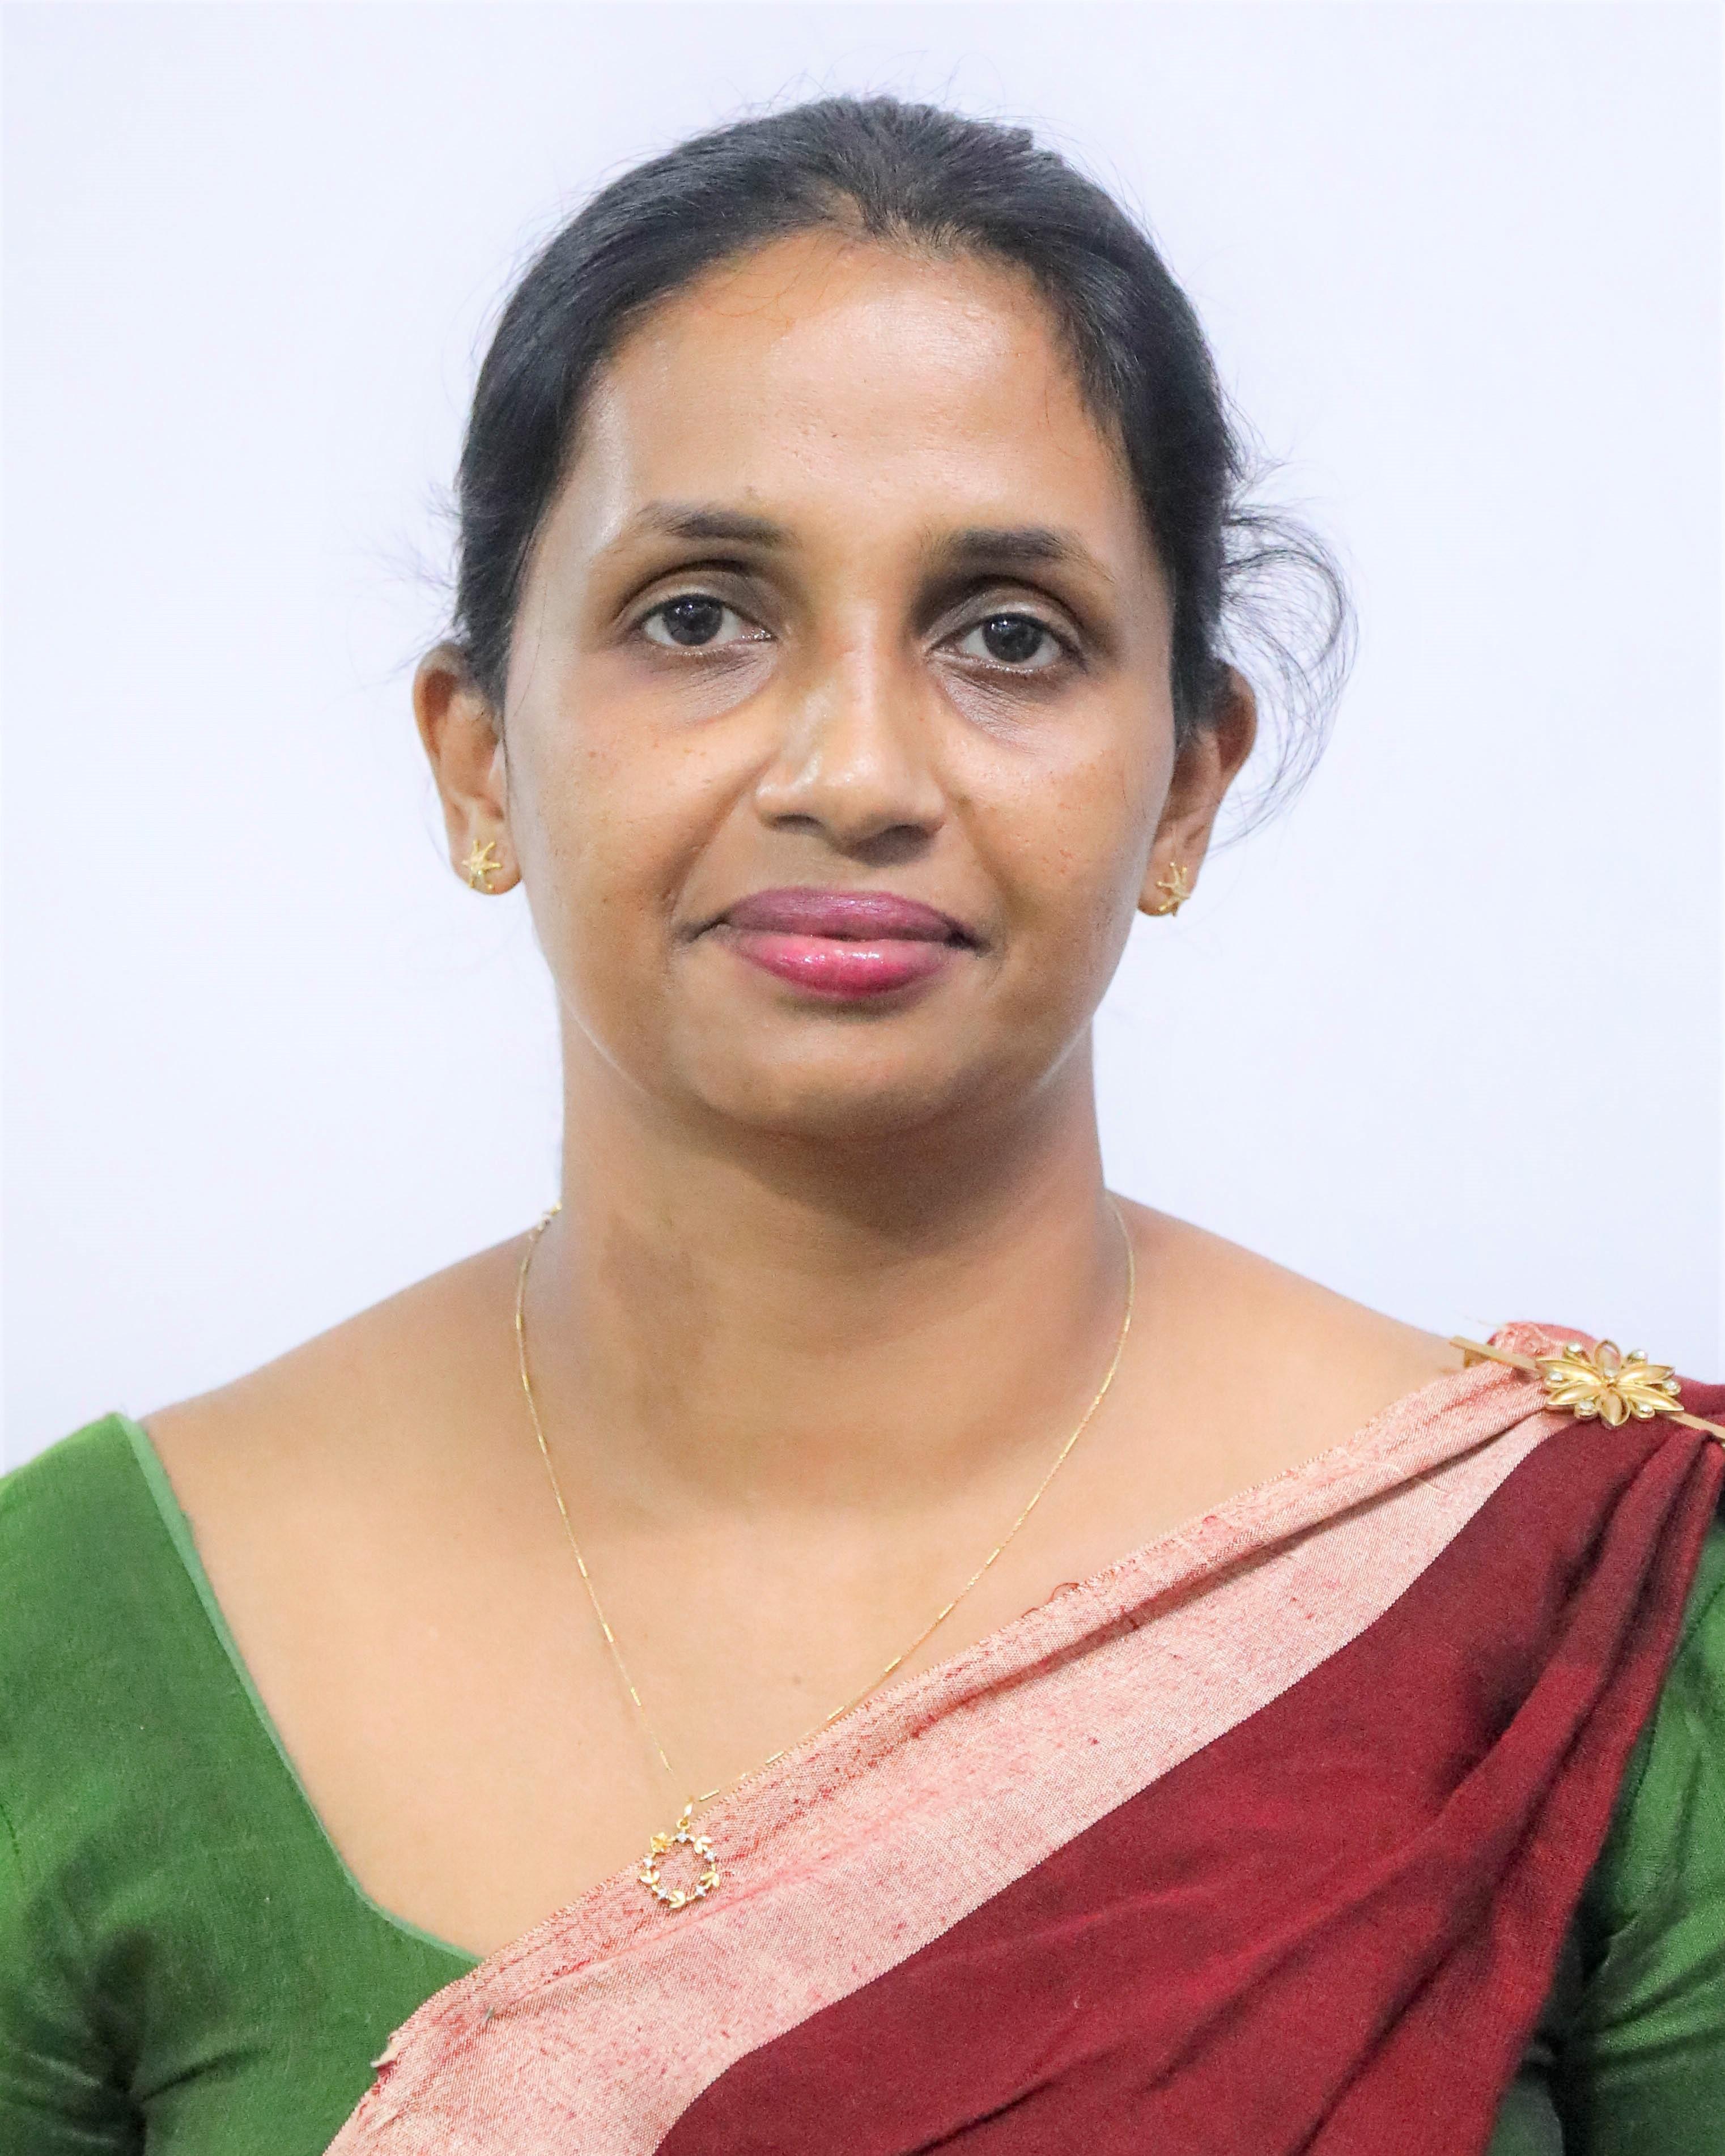 Ms. Wathsala Thilakarathne